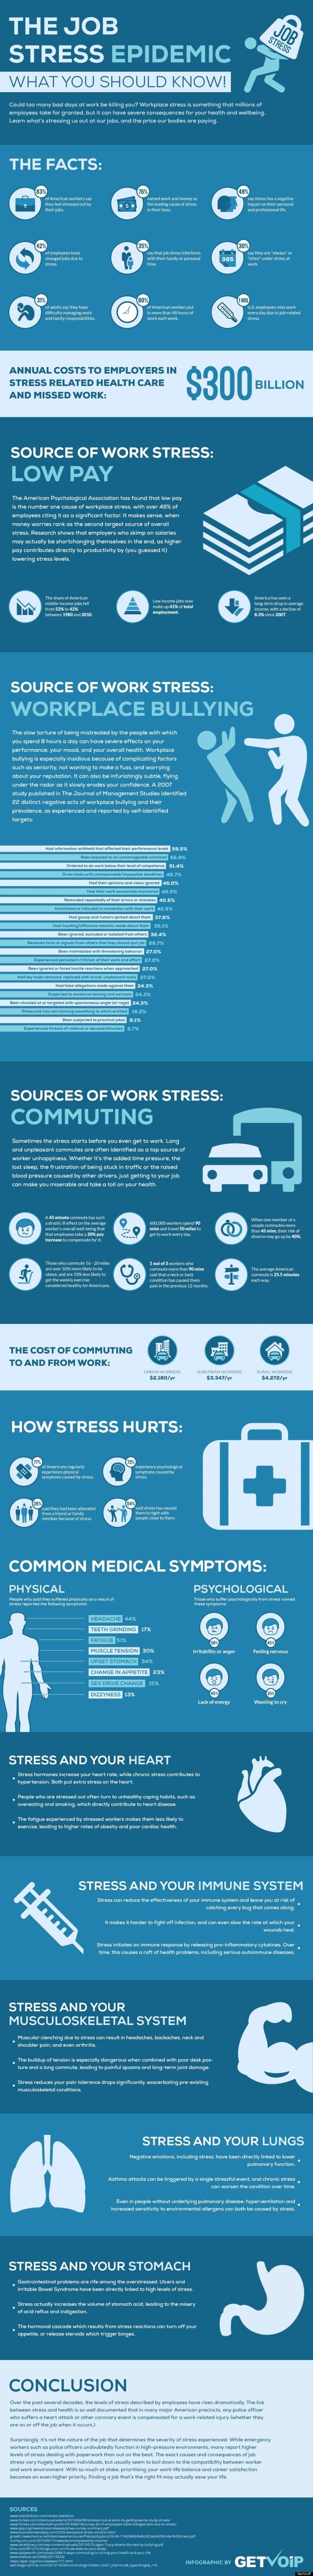 stressepidemic